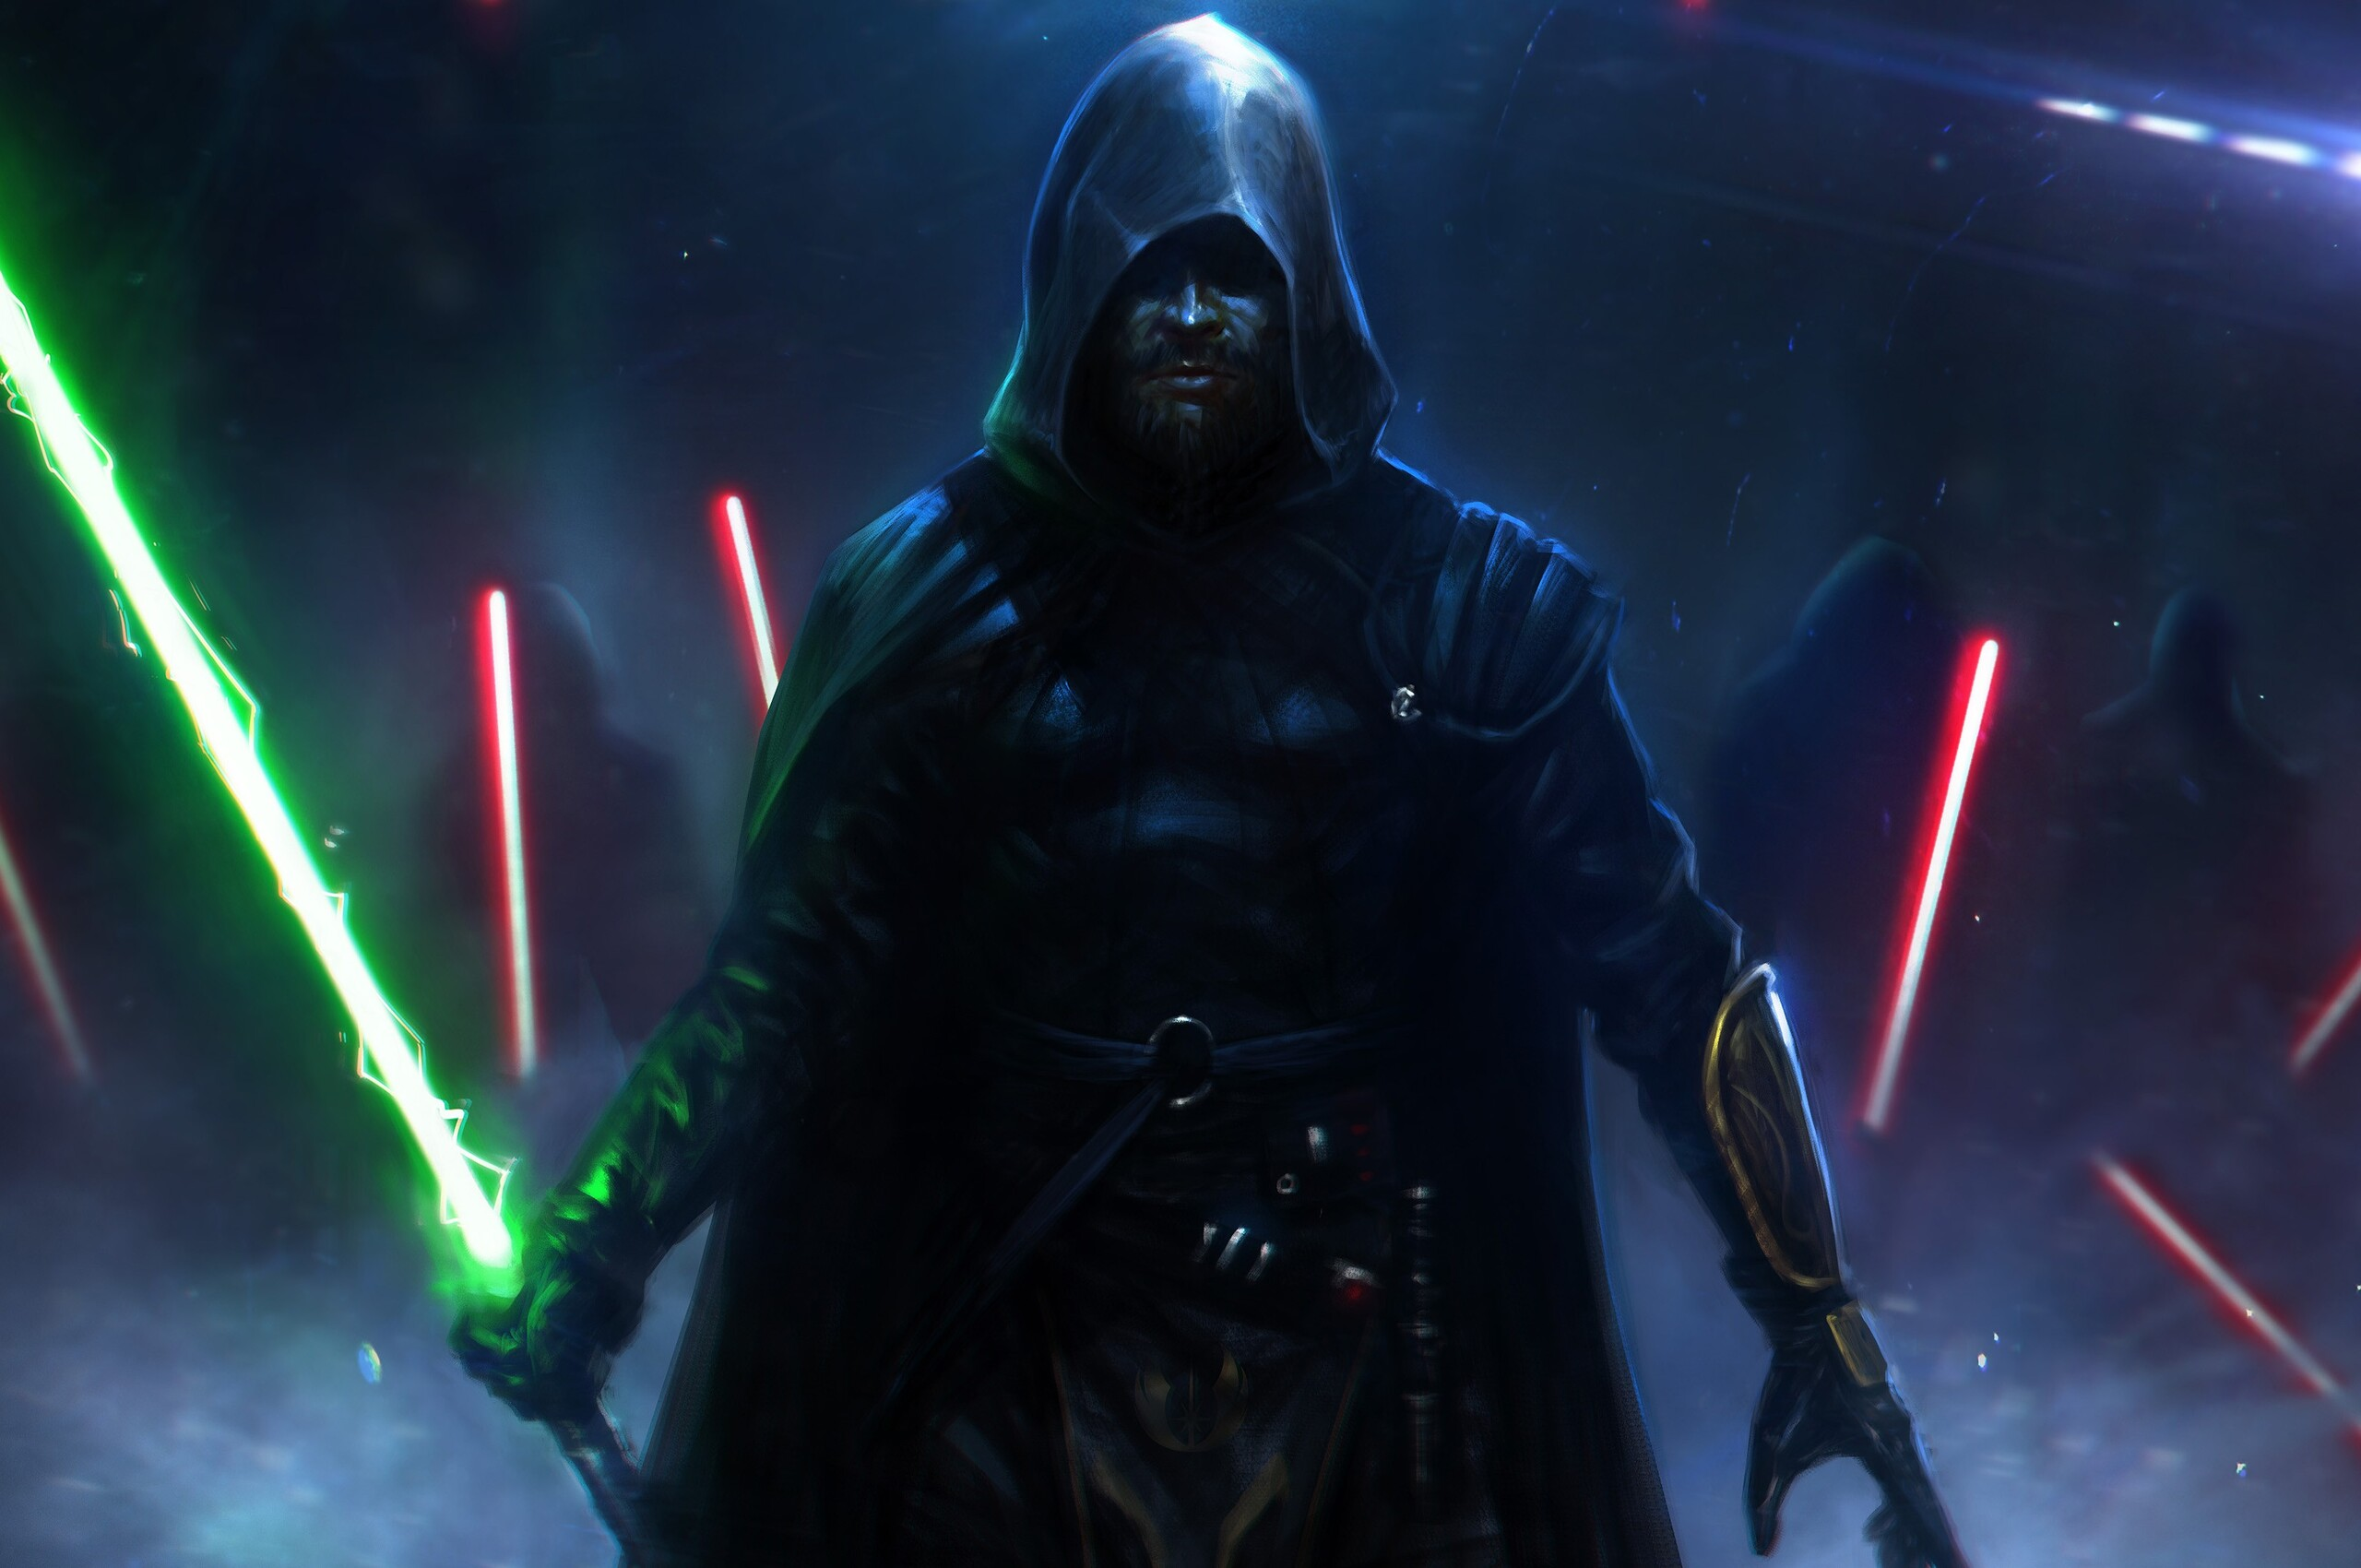 star wars lightsaber science fiction 7s